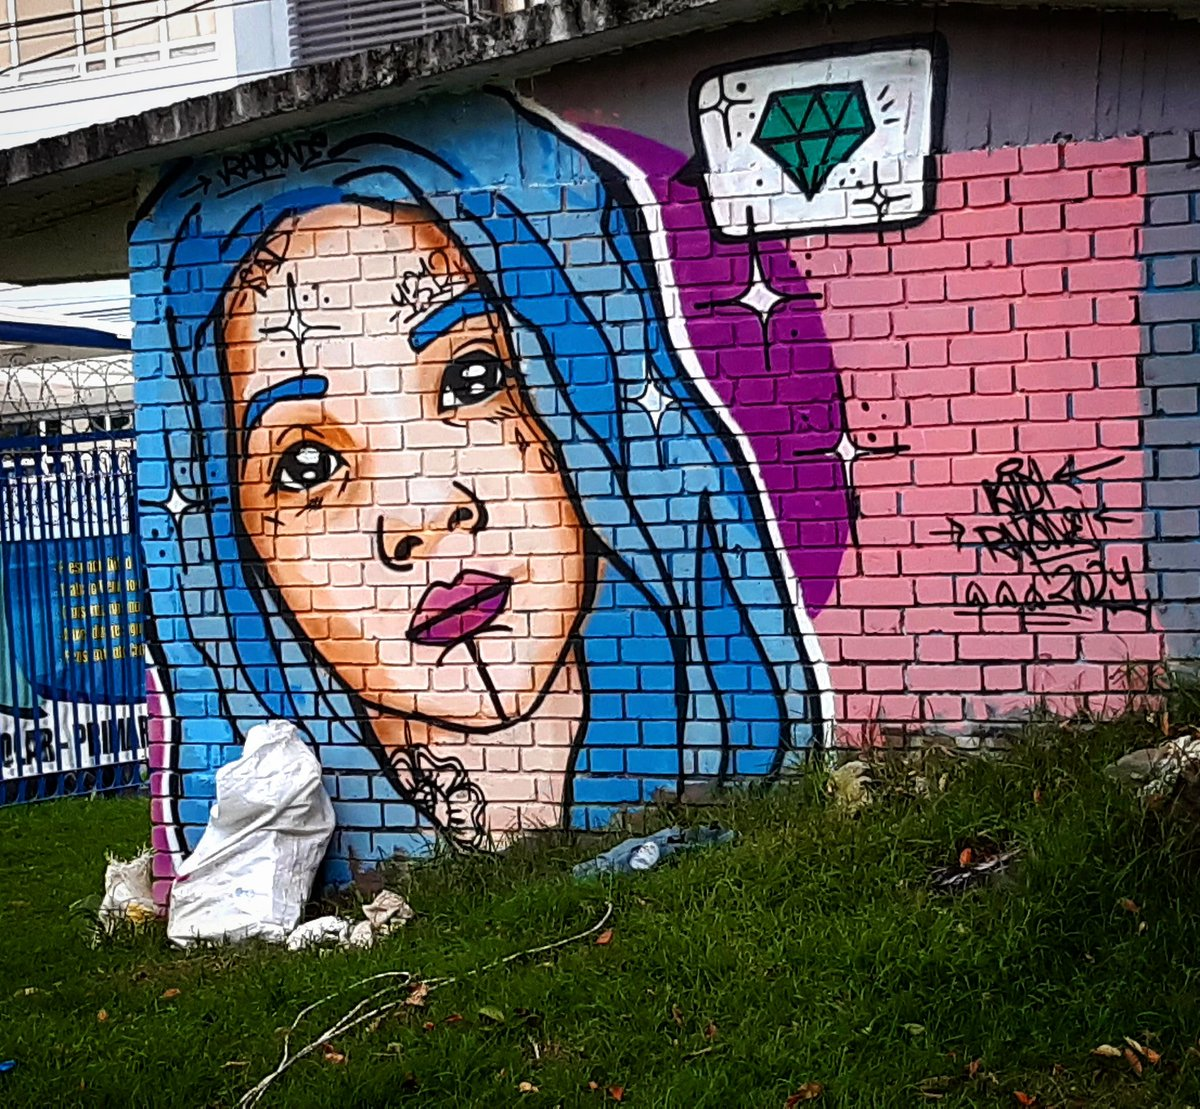 Domingo  . . #Colombia #Bogotá🇨🇴 #StreetArt #artecallejero #graffiti #urbanart #arteurbano #graffitiart  #streetarteverywhere #mural #artemuro #wallart #contemporaryart #streets #uniquestreets #artdisplay #photography  #delacalle #streetartphotography  #androidphotography 🚷